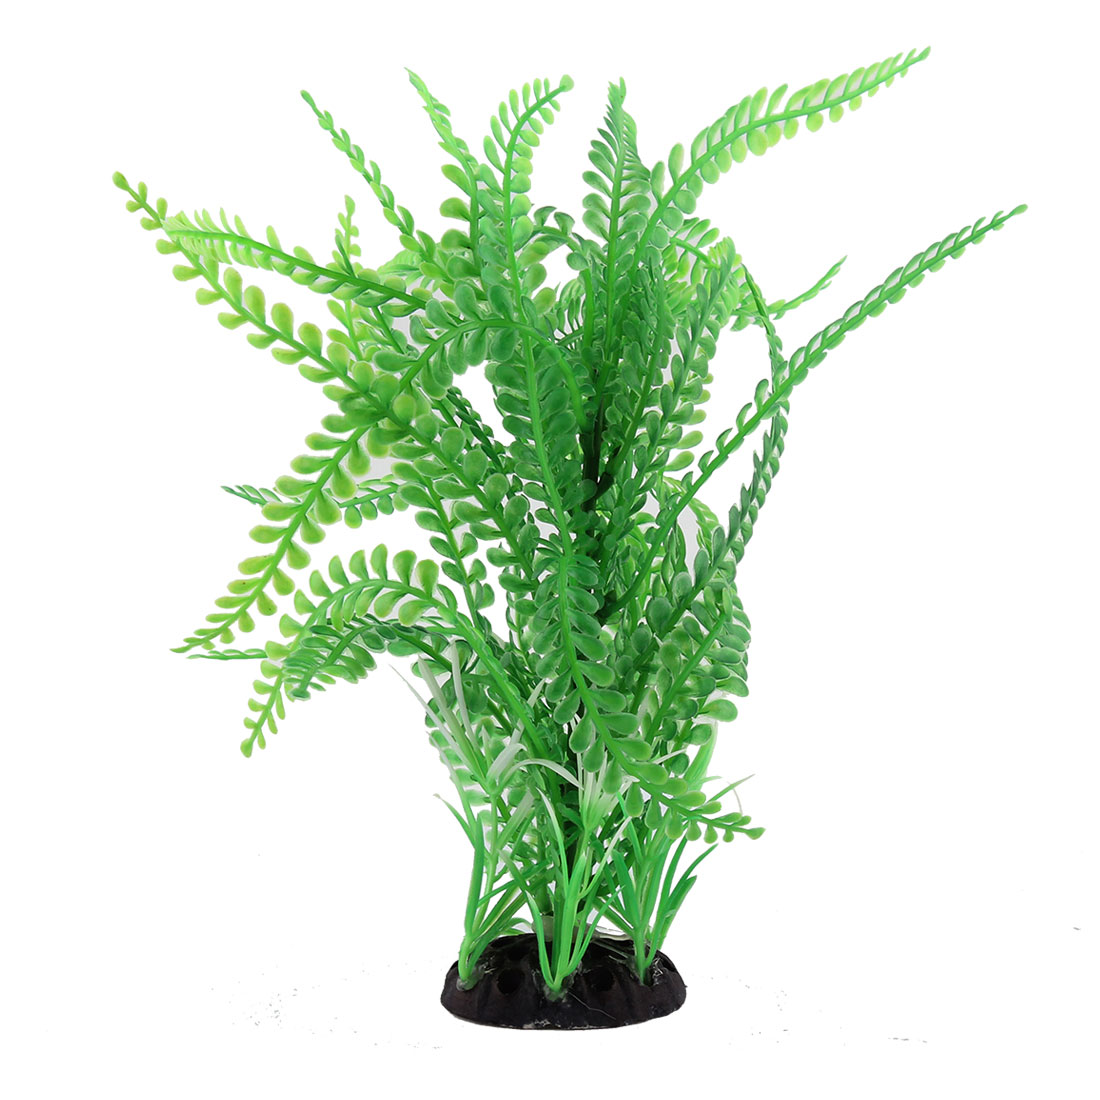 Aquarium Ceramic Base Plastic Artificial Water Grass Plant Decoration Light Green